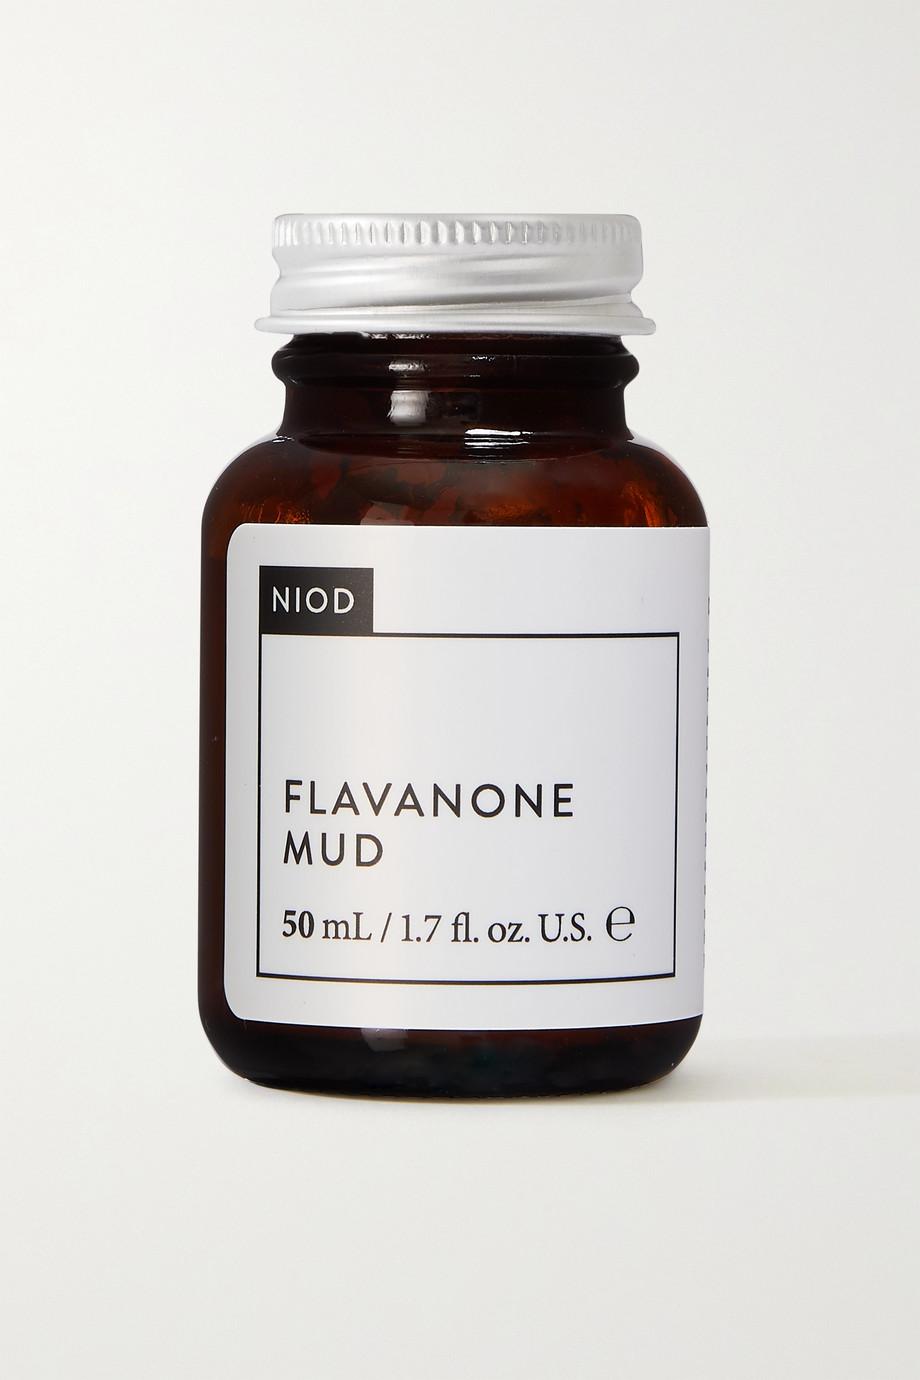 NIOD Flavanone Mud, 50 ml – Gesichtsmaske